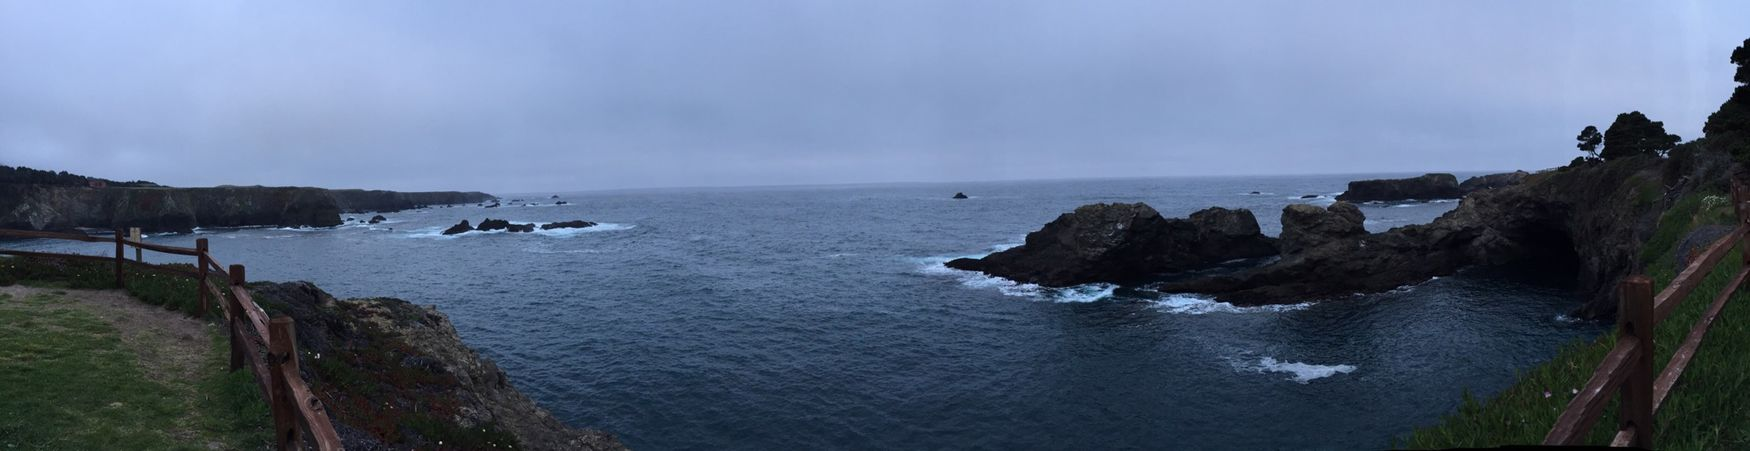 Sea And Sky The Purist (no Edit, No Filter) Norcal Coast